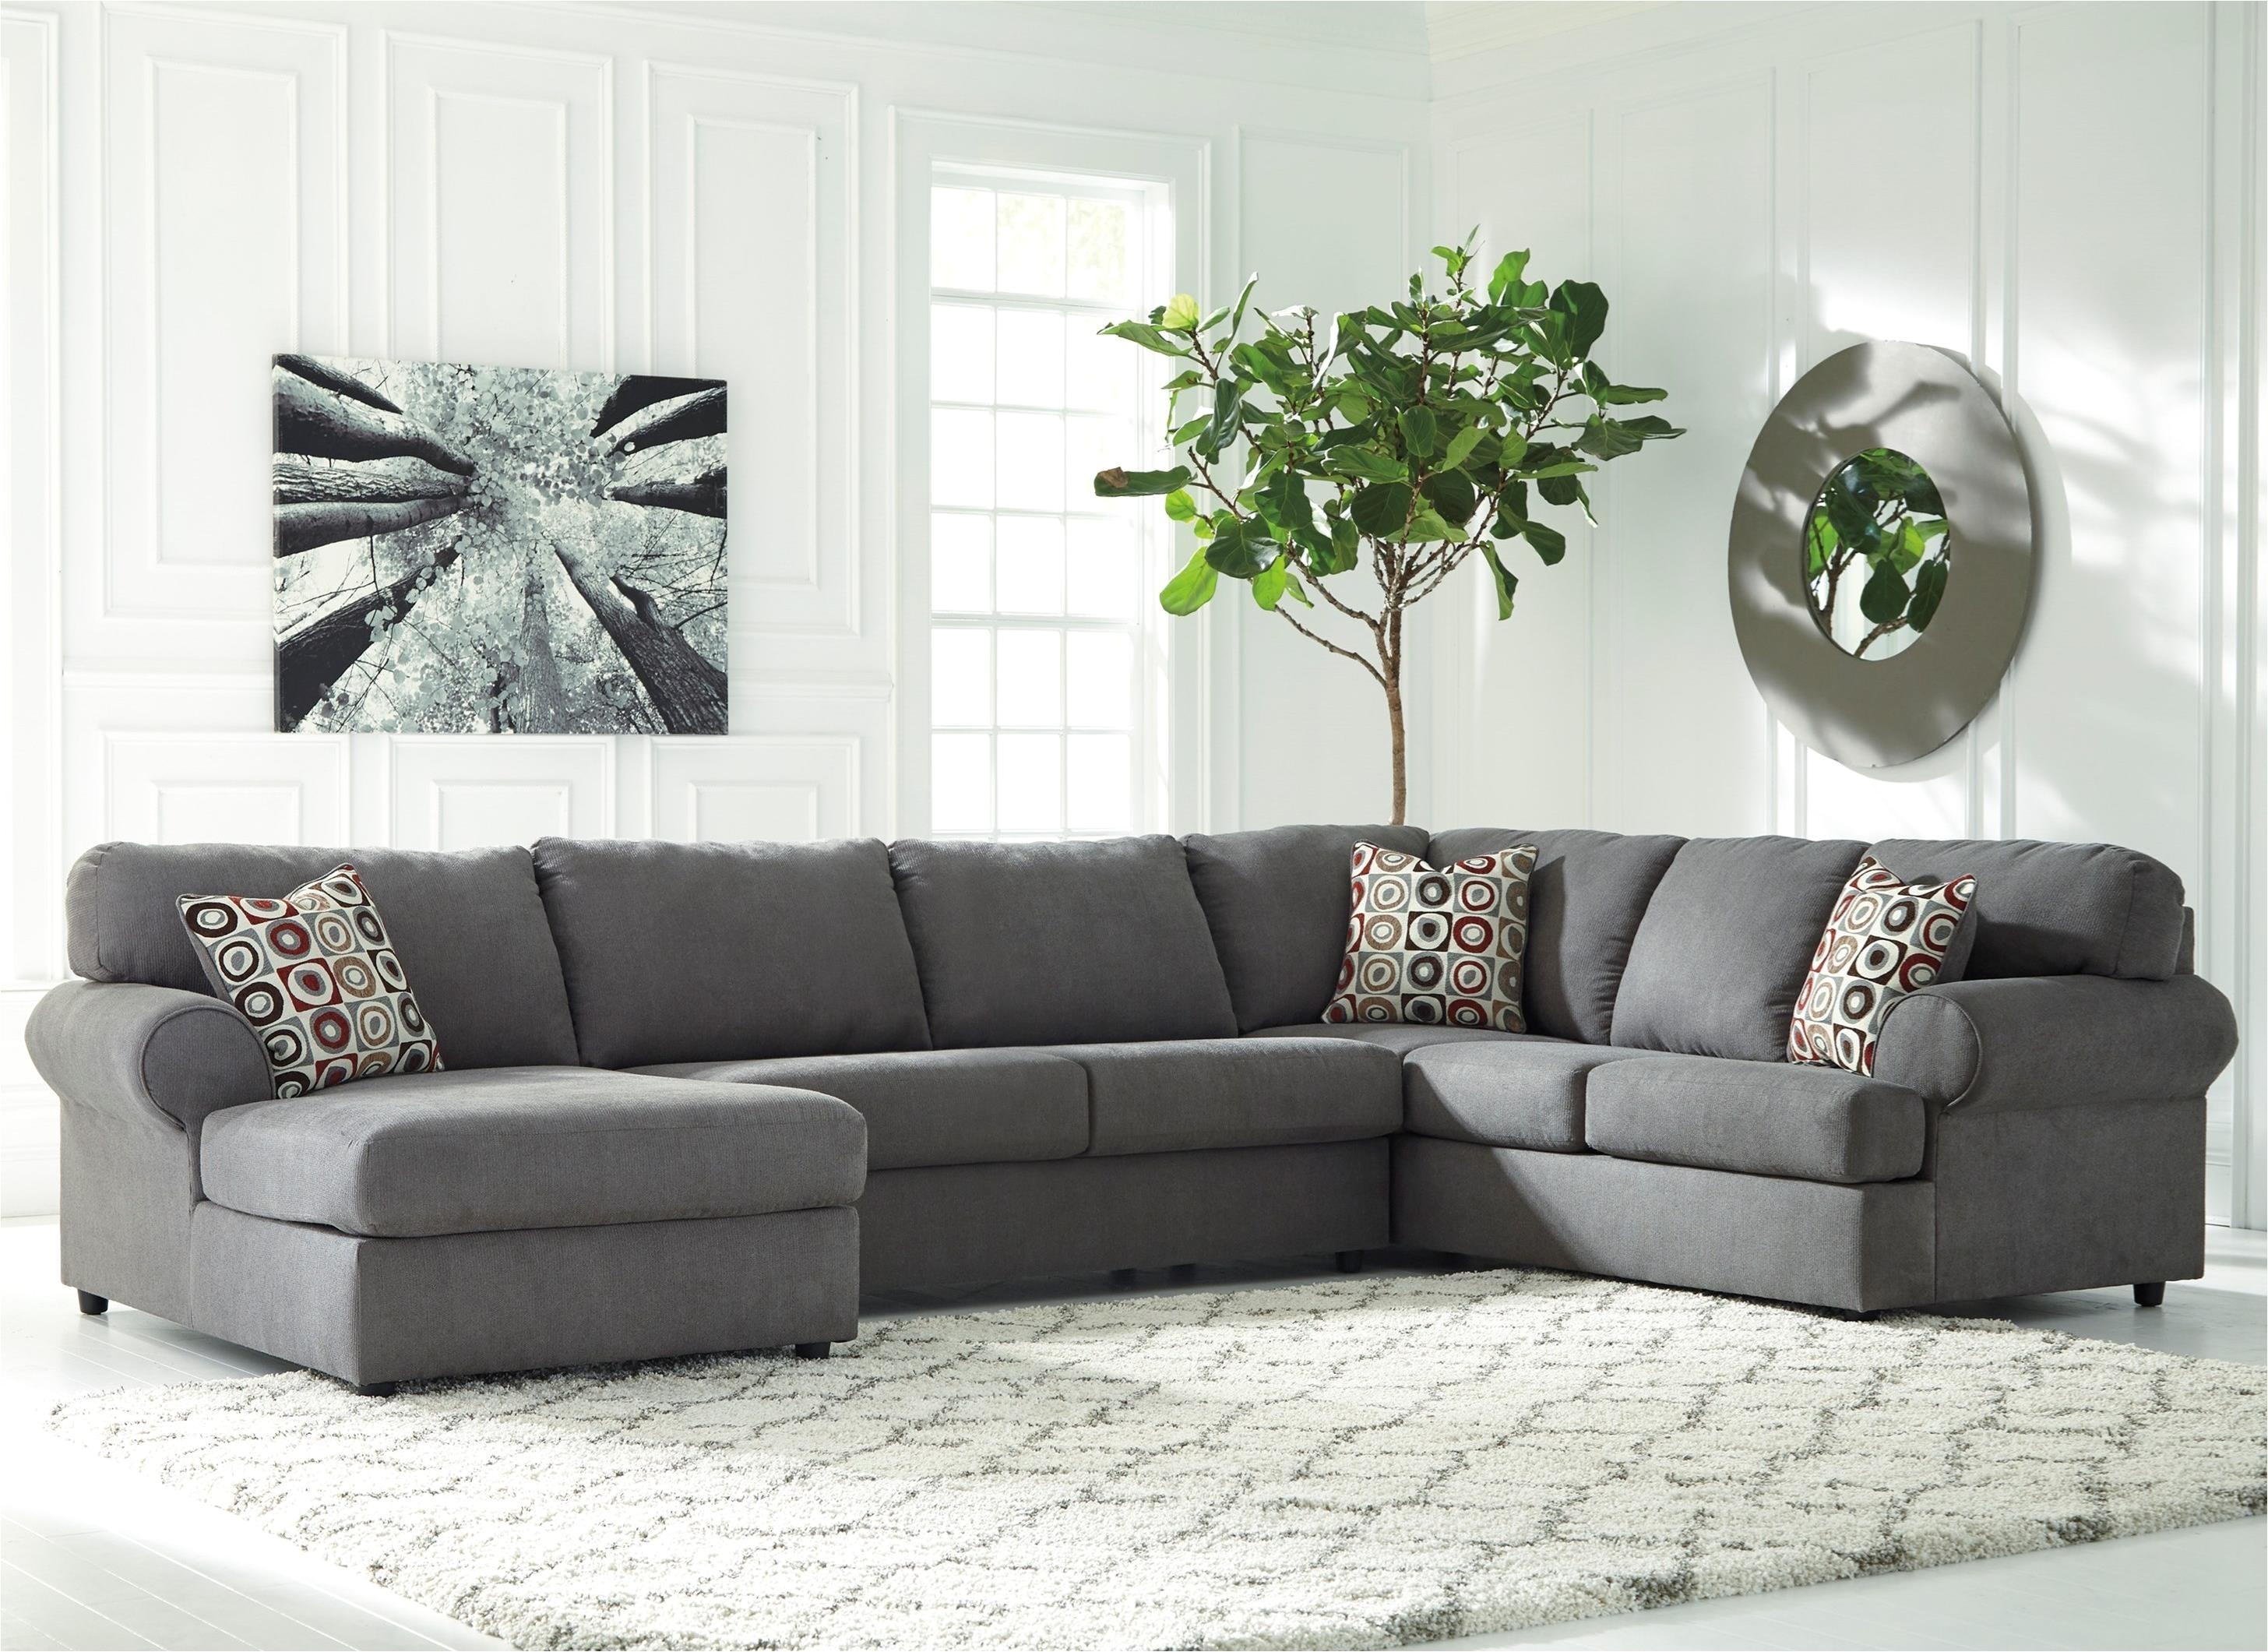 unique ashley furniture chaise sofa sofas ashley furniture small sectional ashley furniture couches